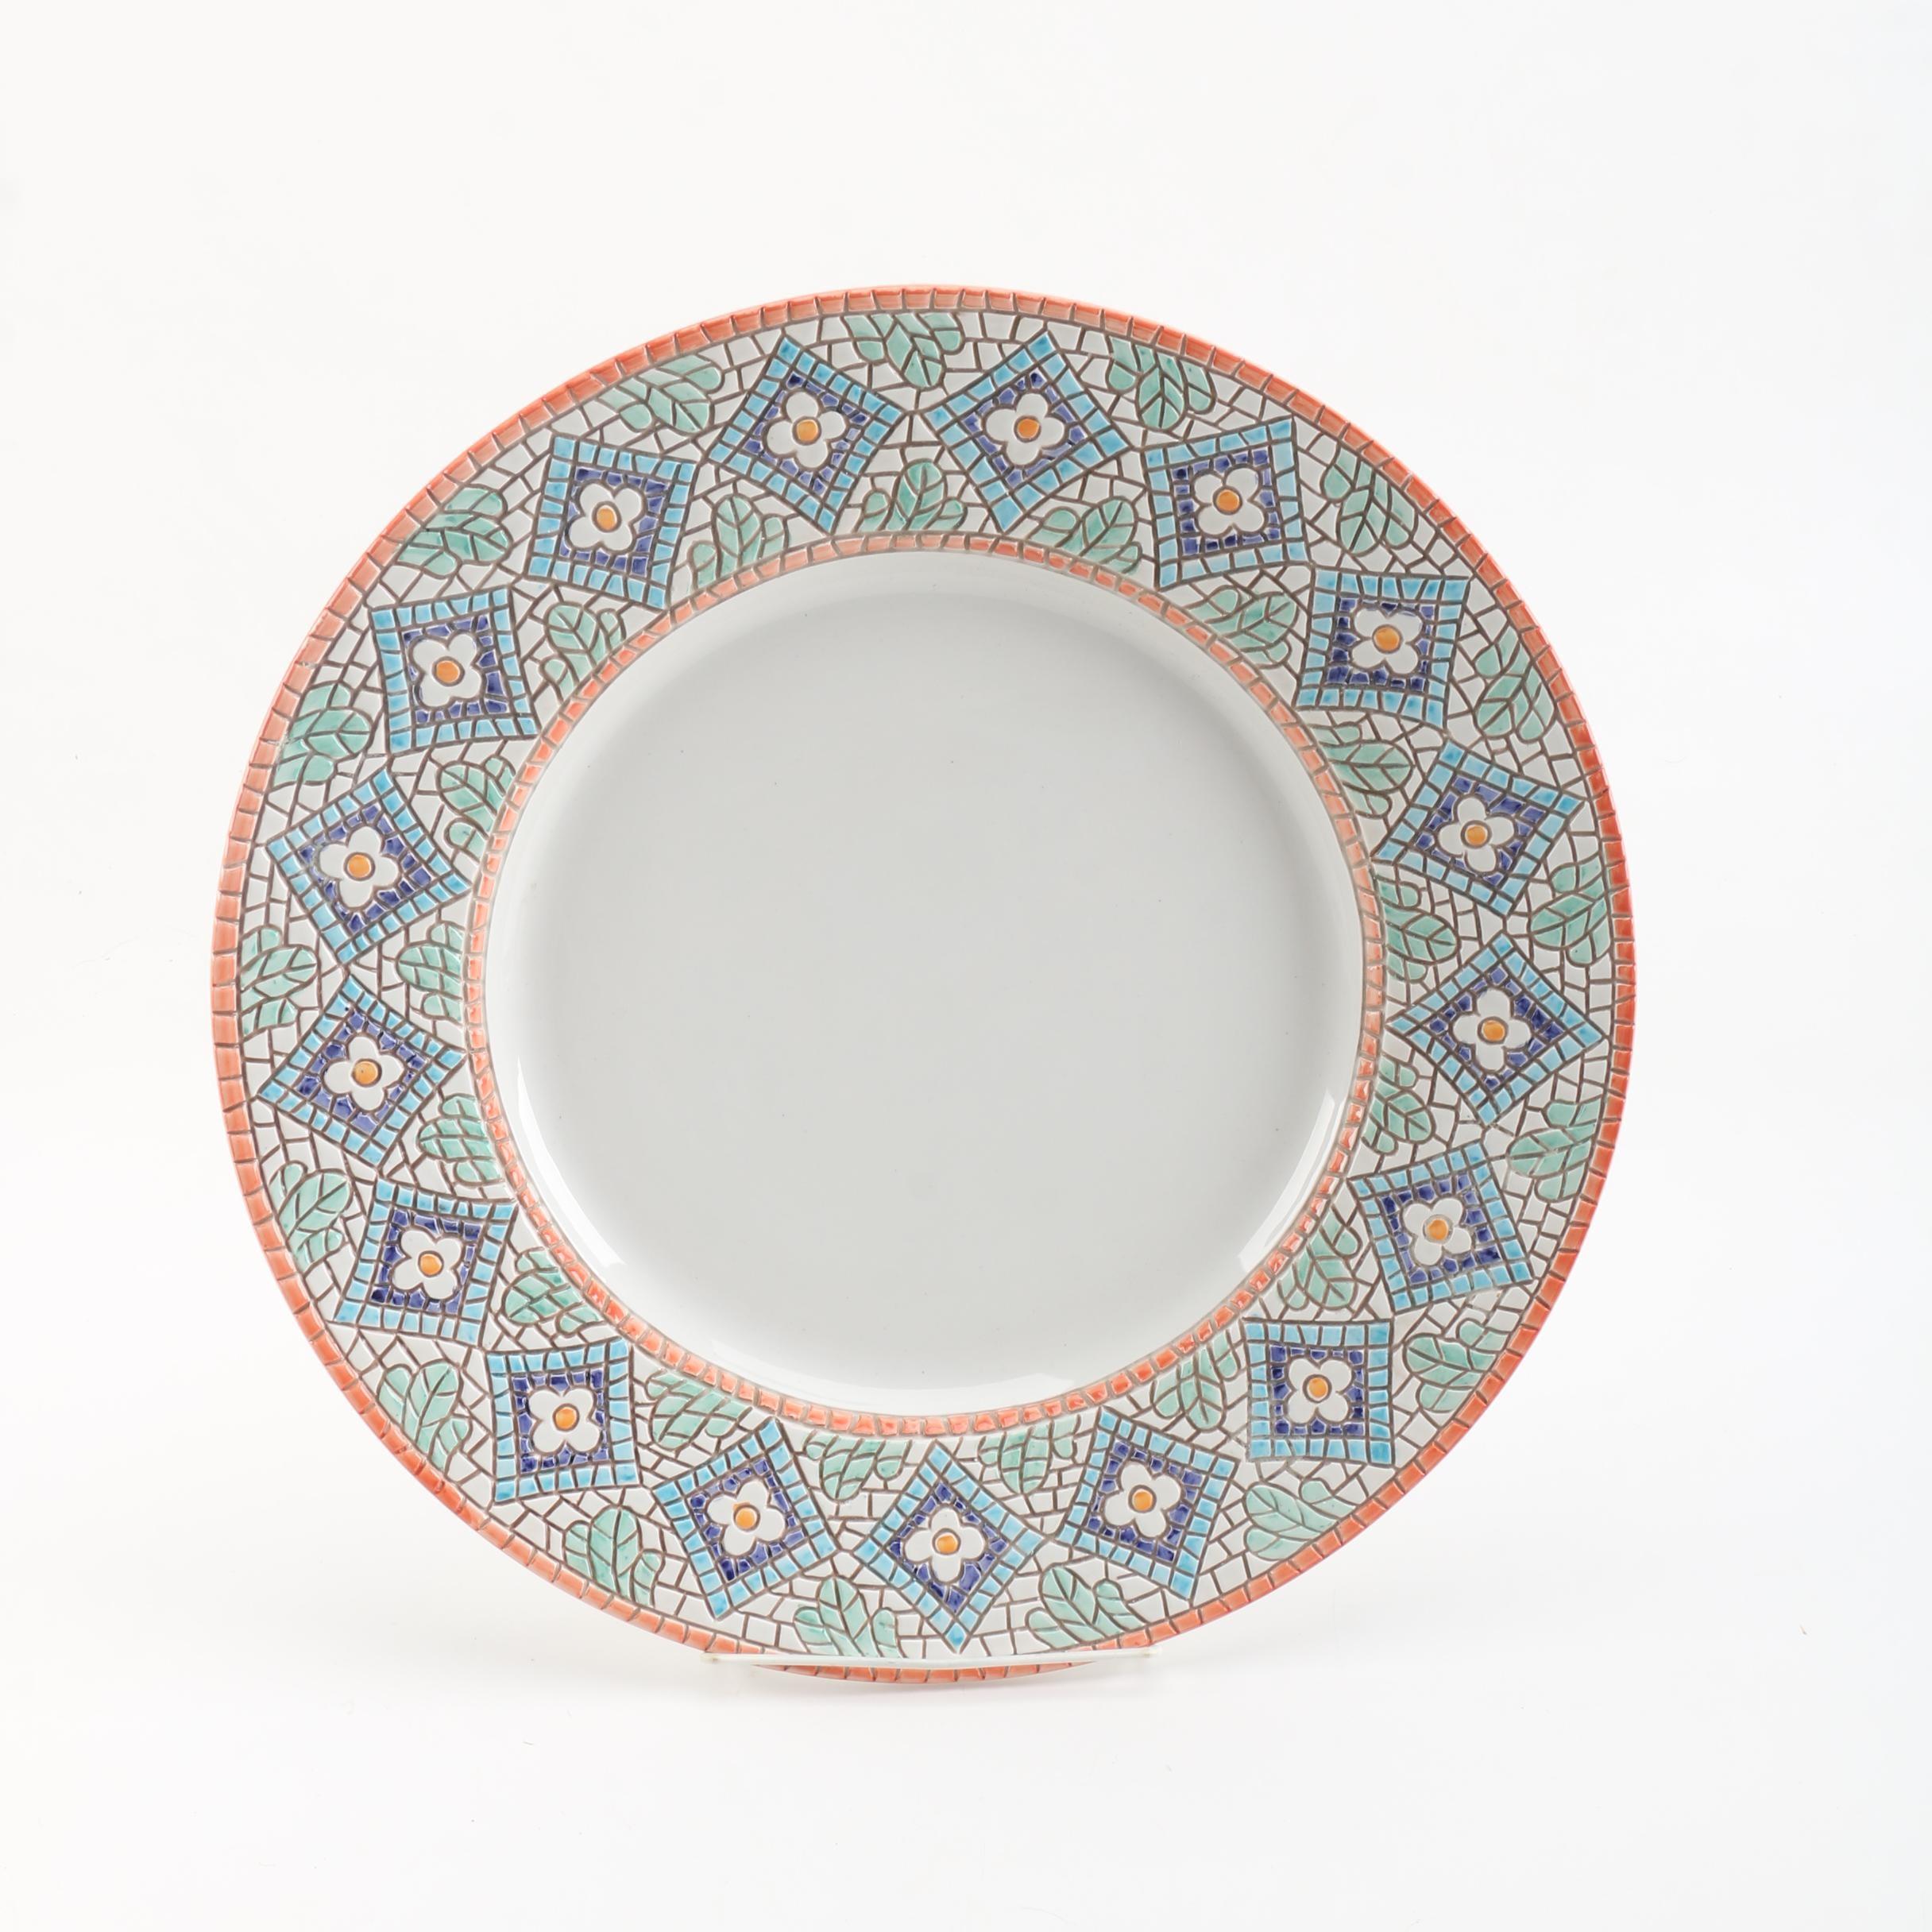 Neiman Marcus Hand-Painted Mosaic Style Ceramic Plate